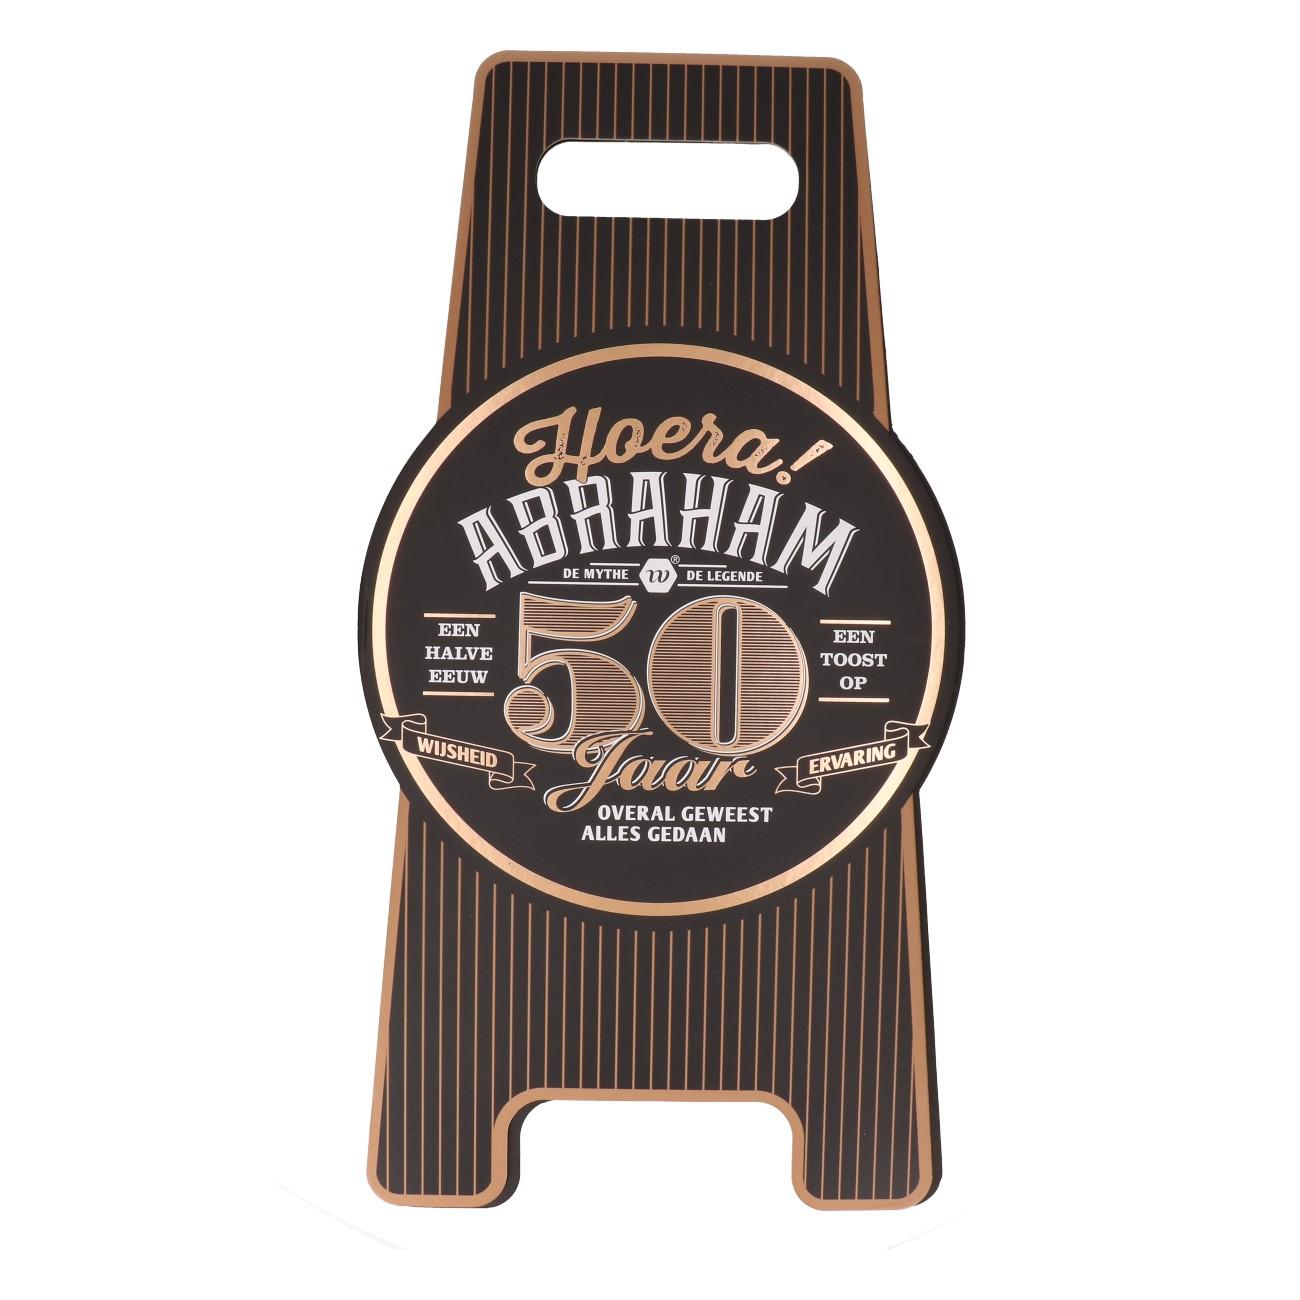 Vloerbord Abraham 50 jaar